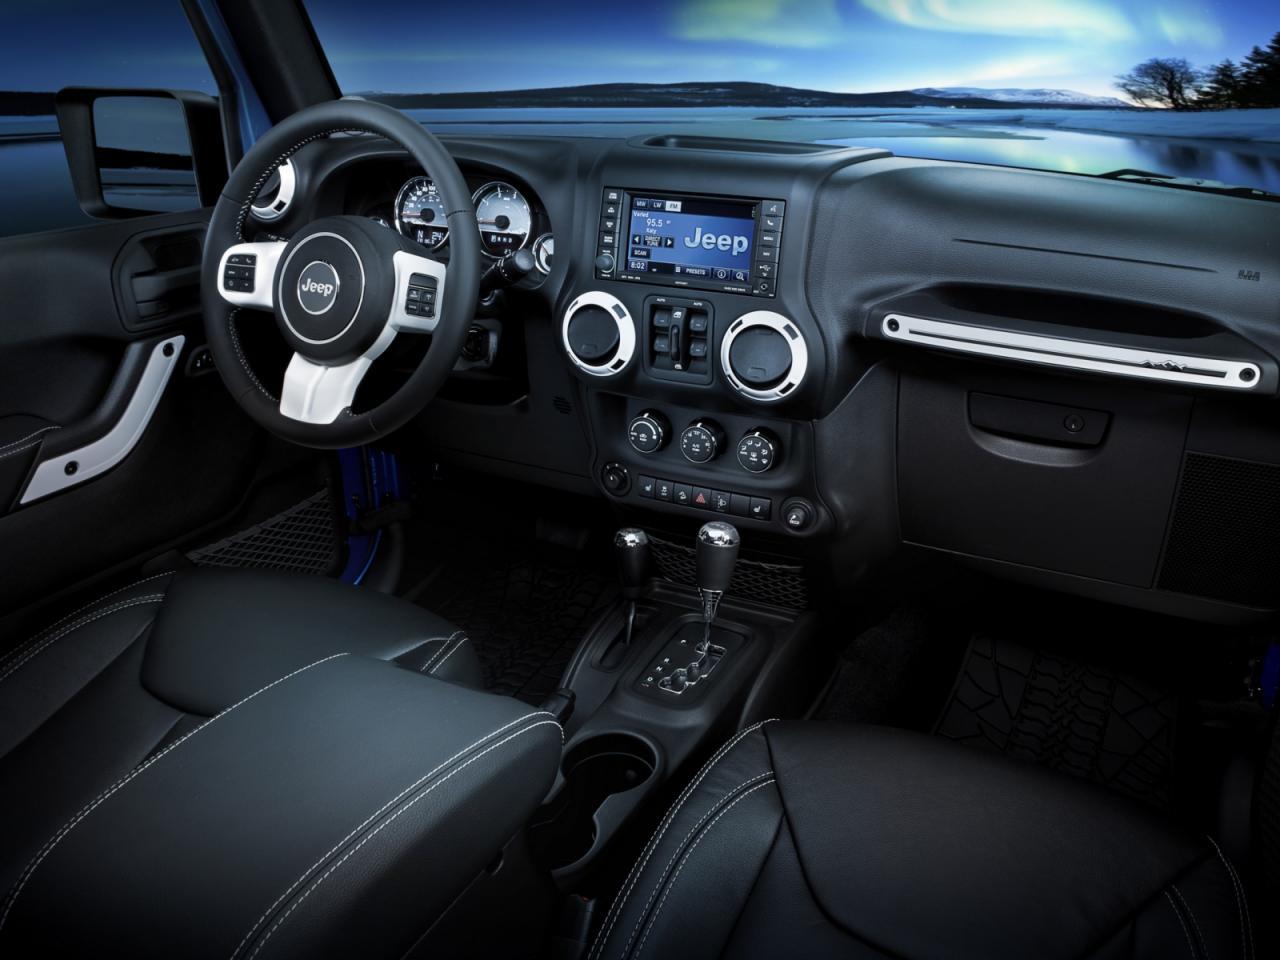 2013 Jeep Wrangler Polar limited edition 2